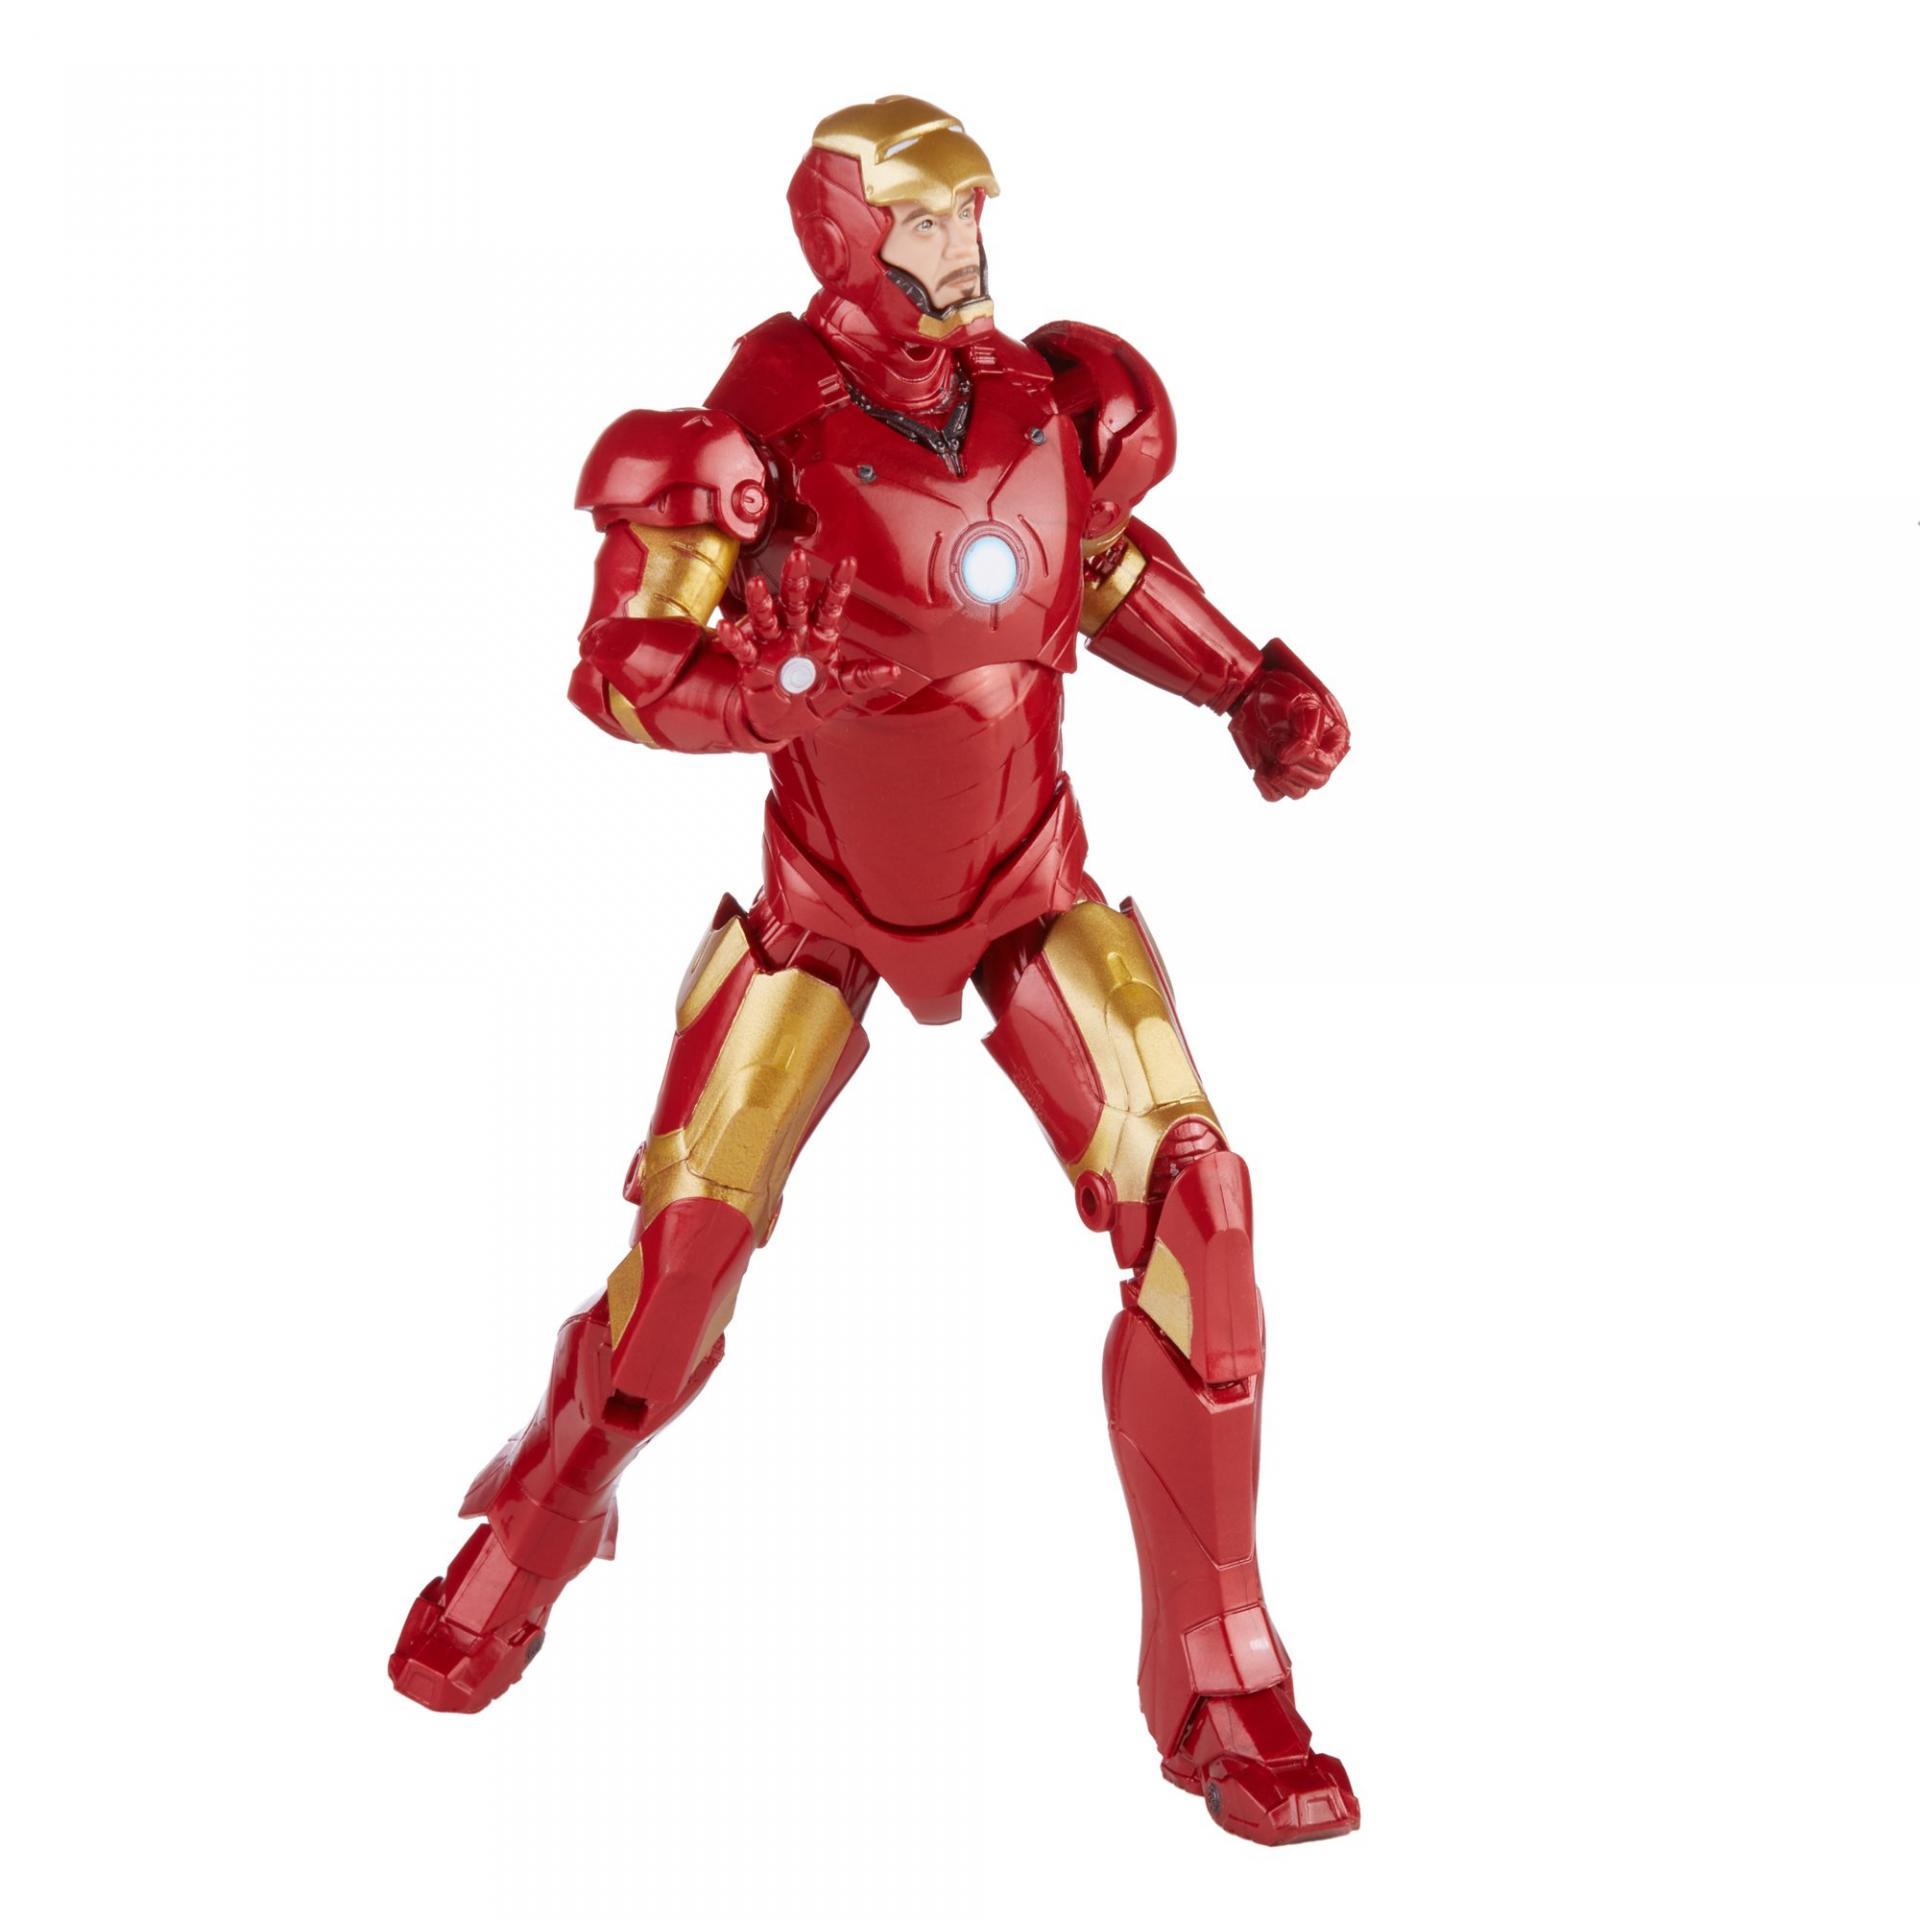 Marvel legends series hasbro iron man mark 37